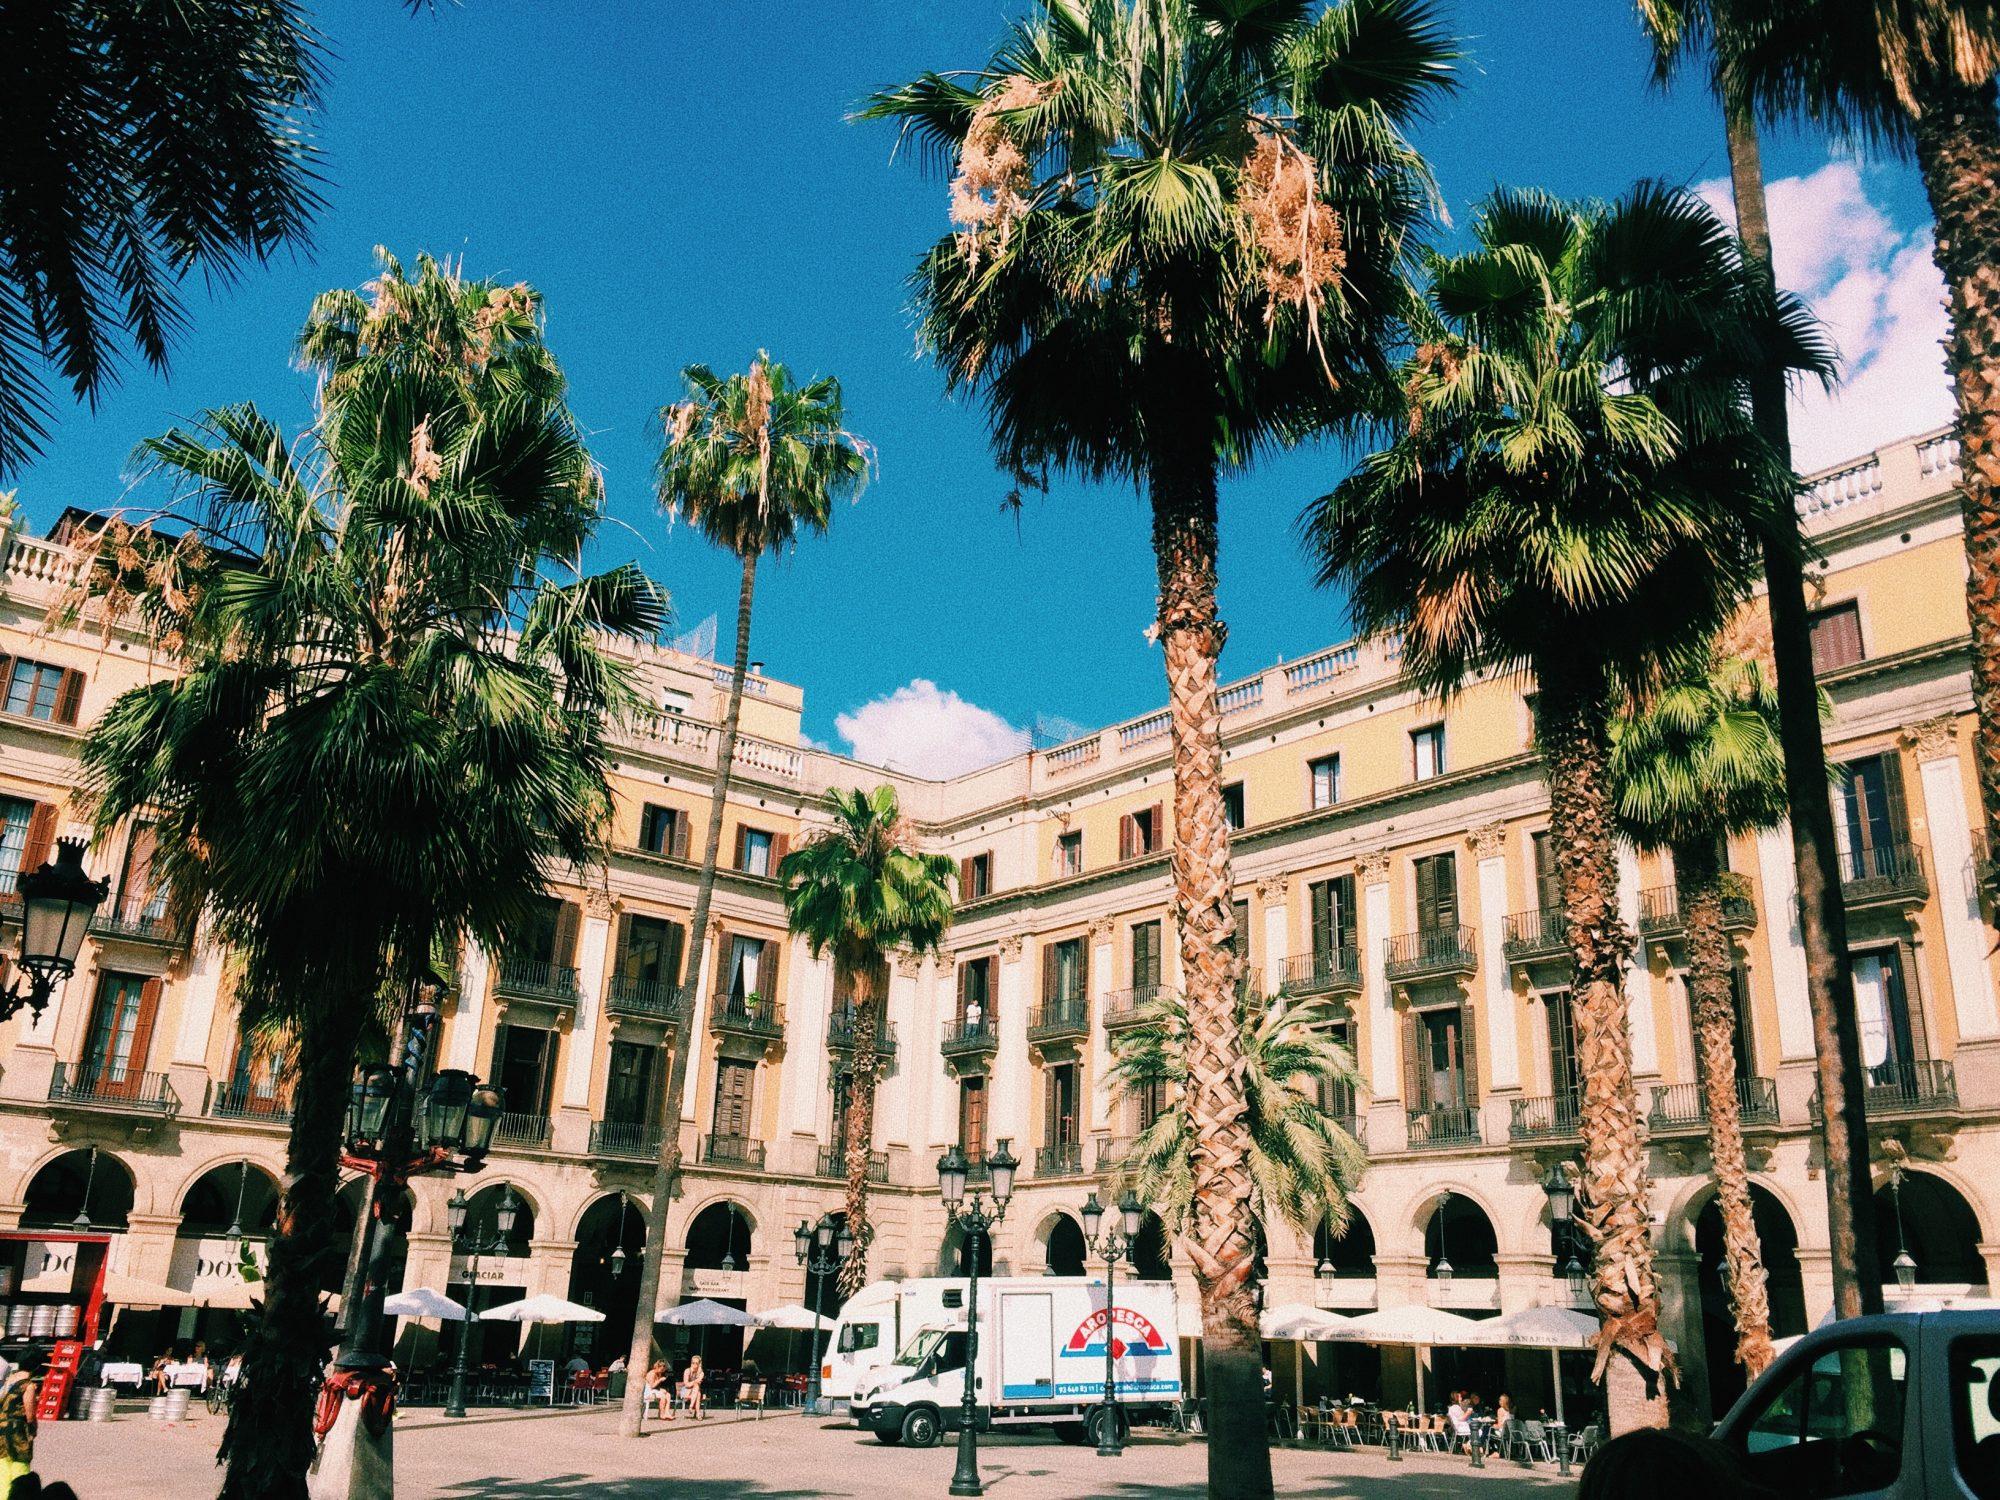 Barcelona – The Gothic Quarter